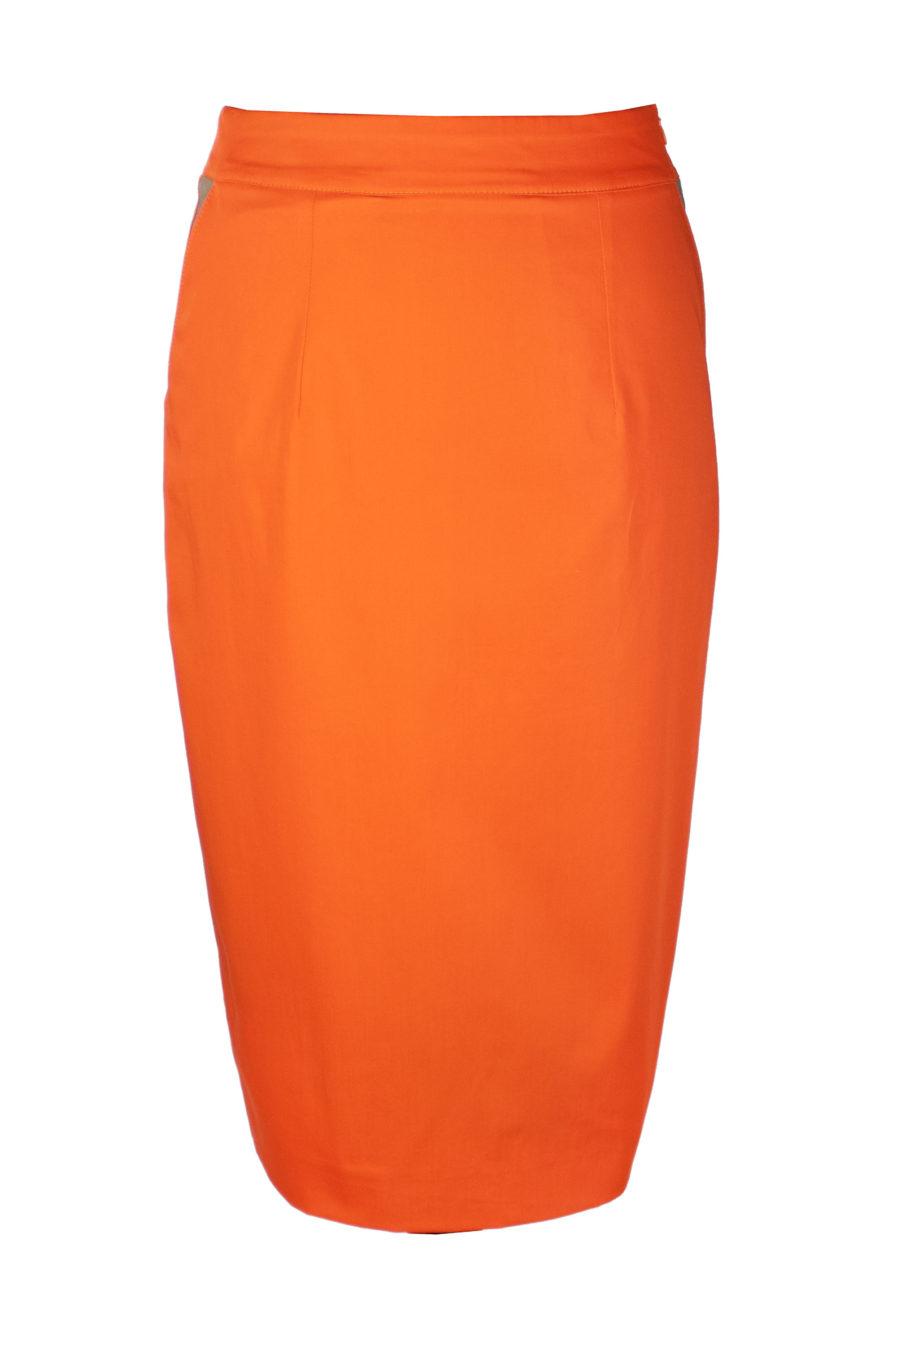 Bleistiftrock Orange-Gold